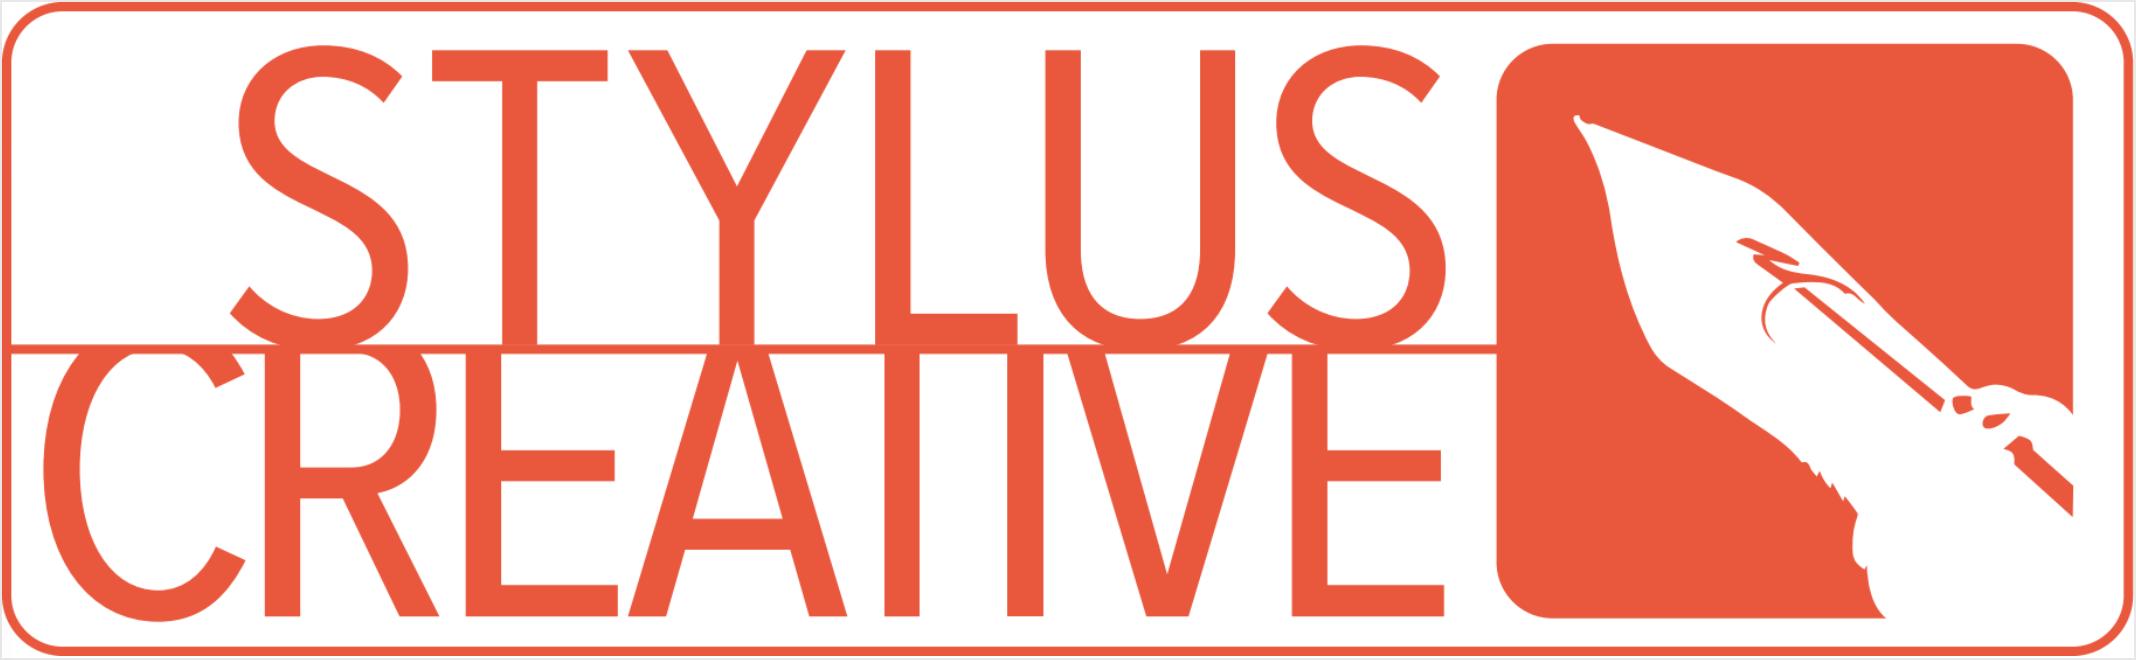 Stylus Creative